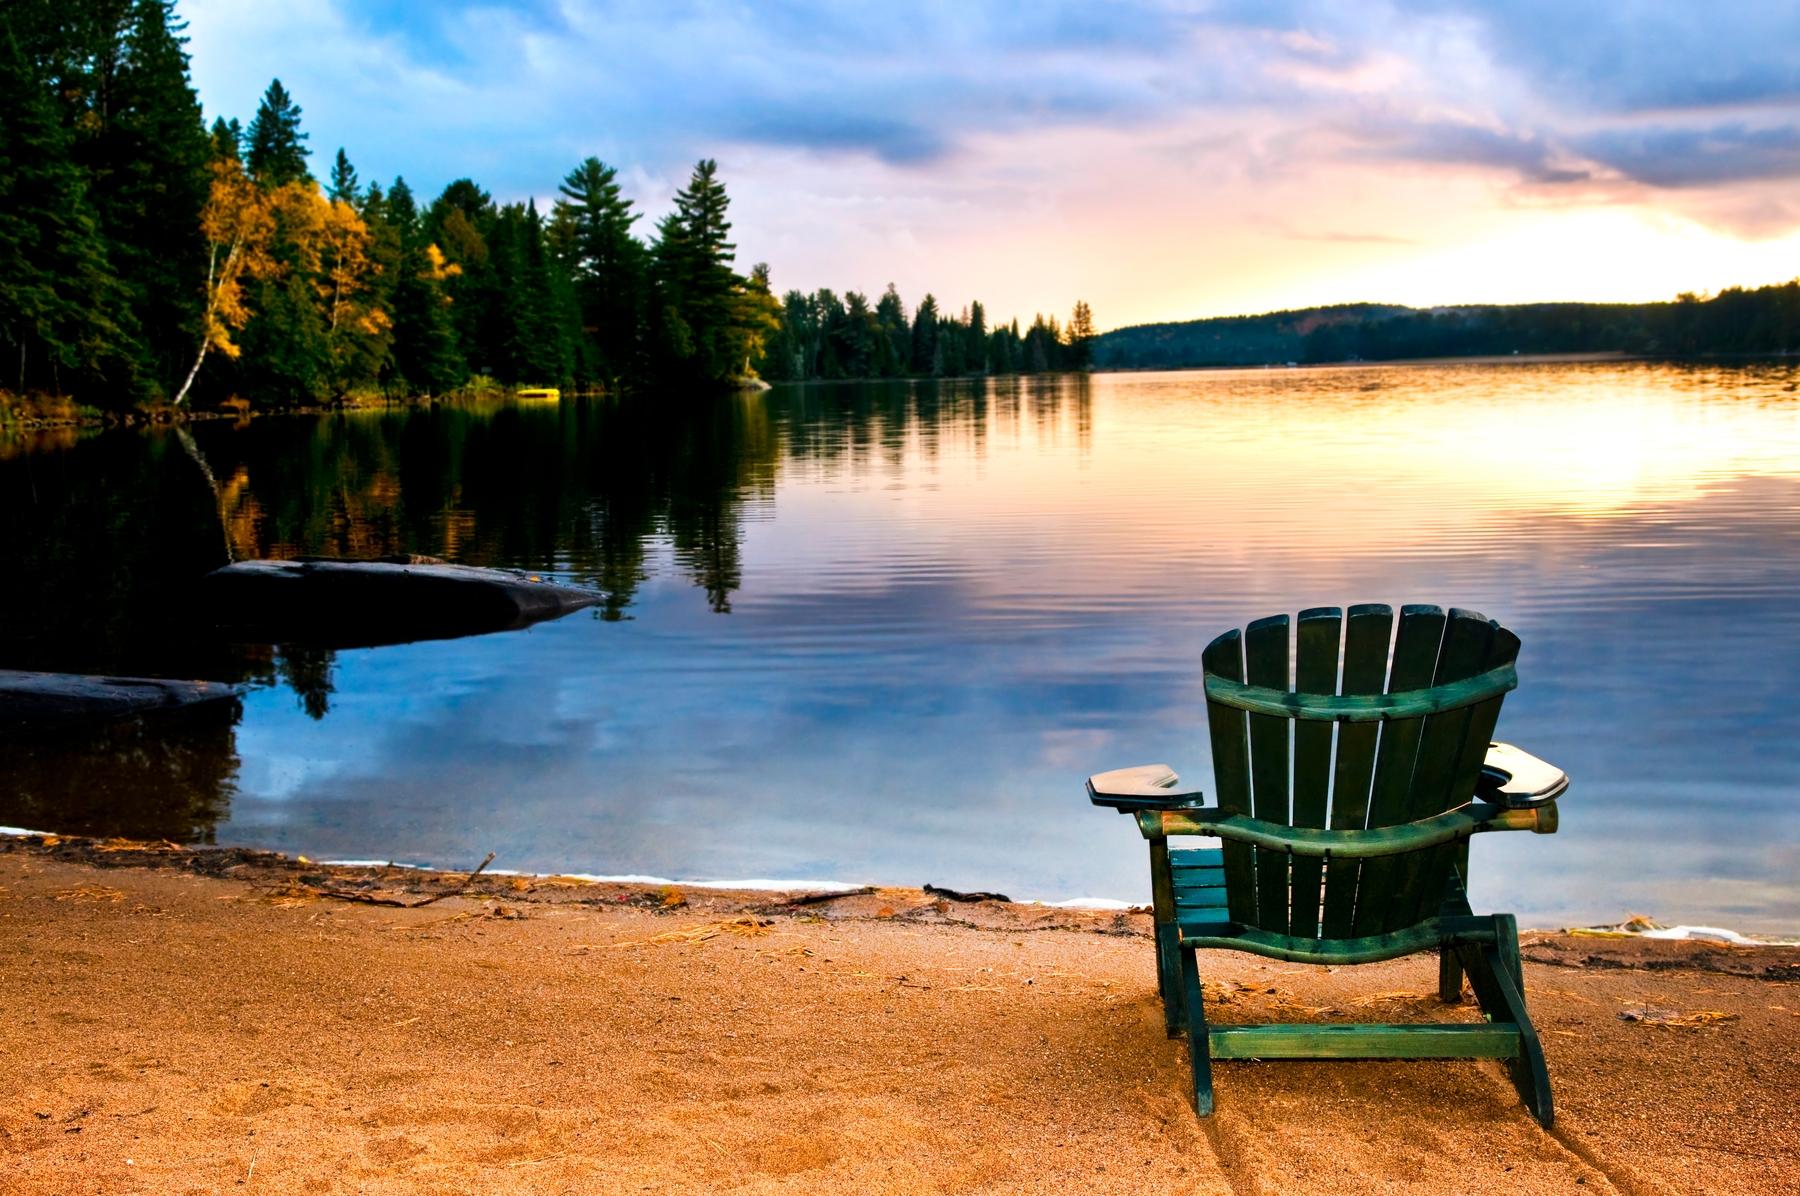 Muskoka chair by the lake at sunset